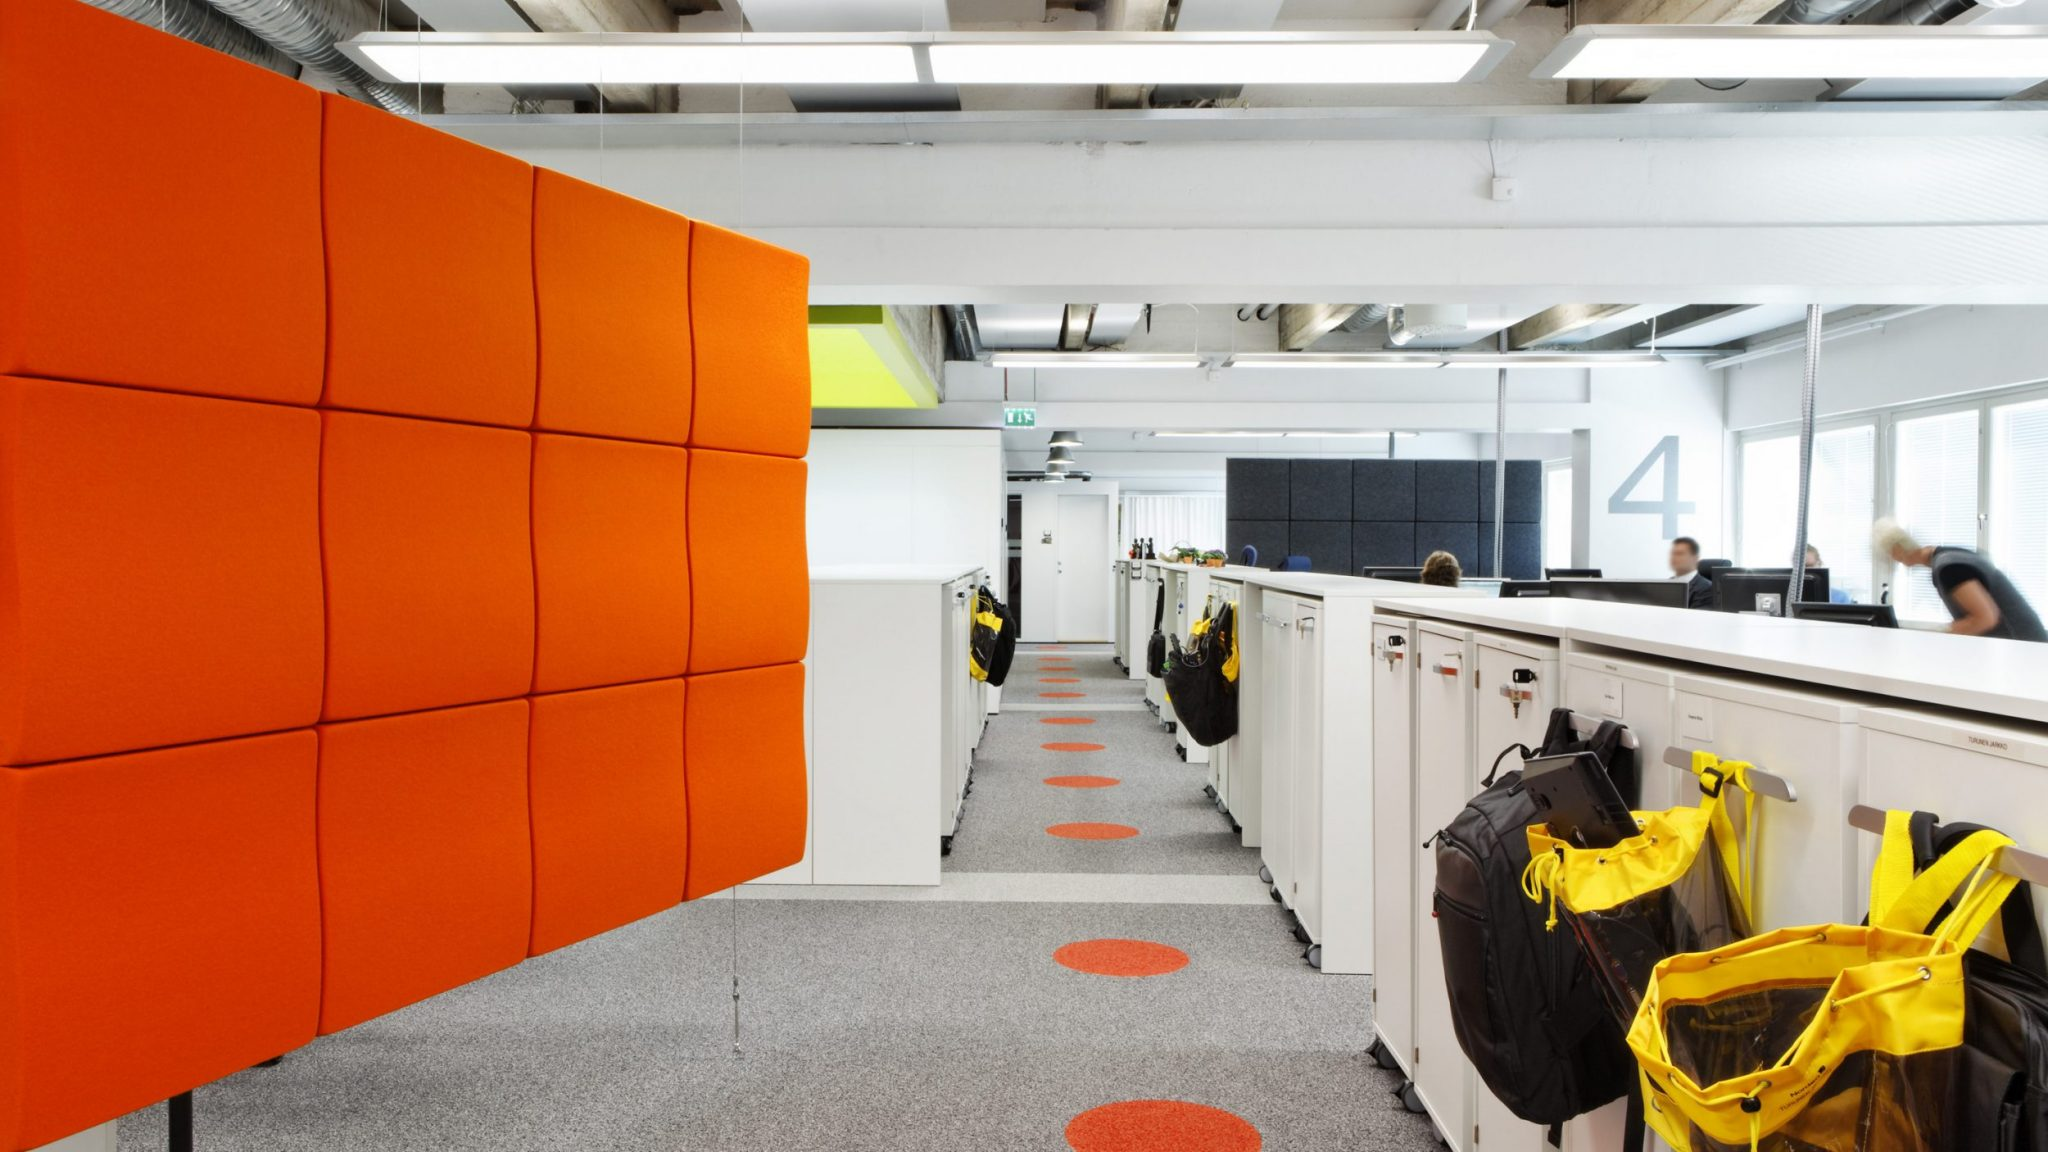 Nordea-Bank-Finland-GI-Project-5